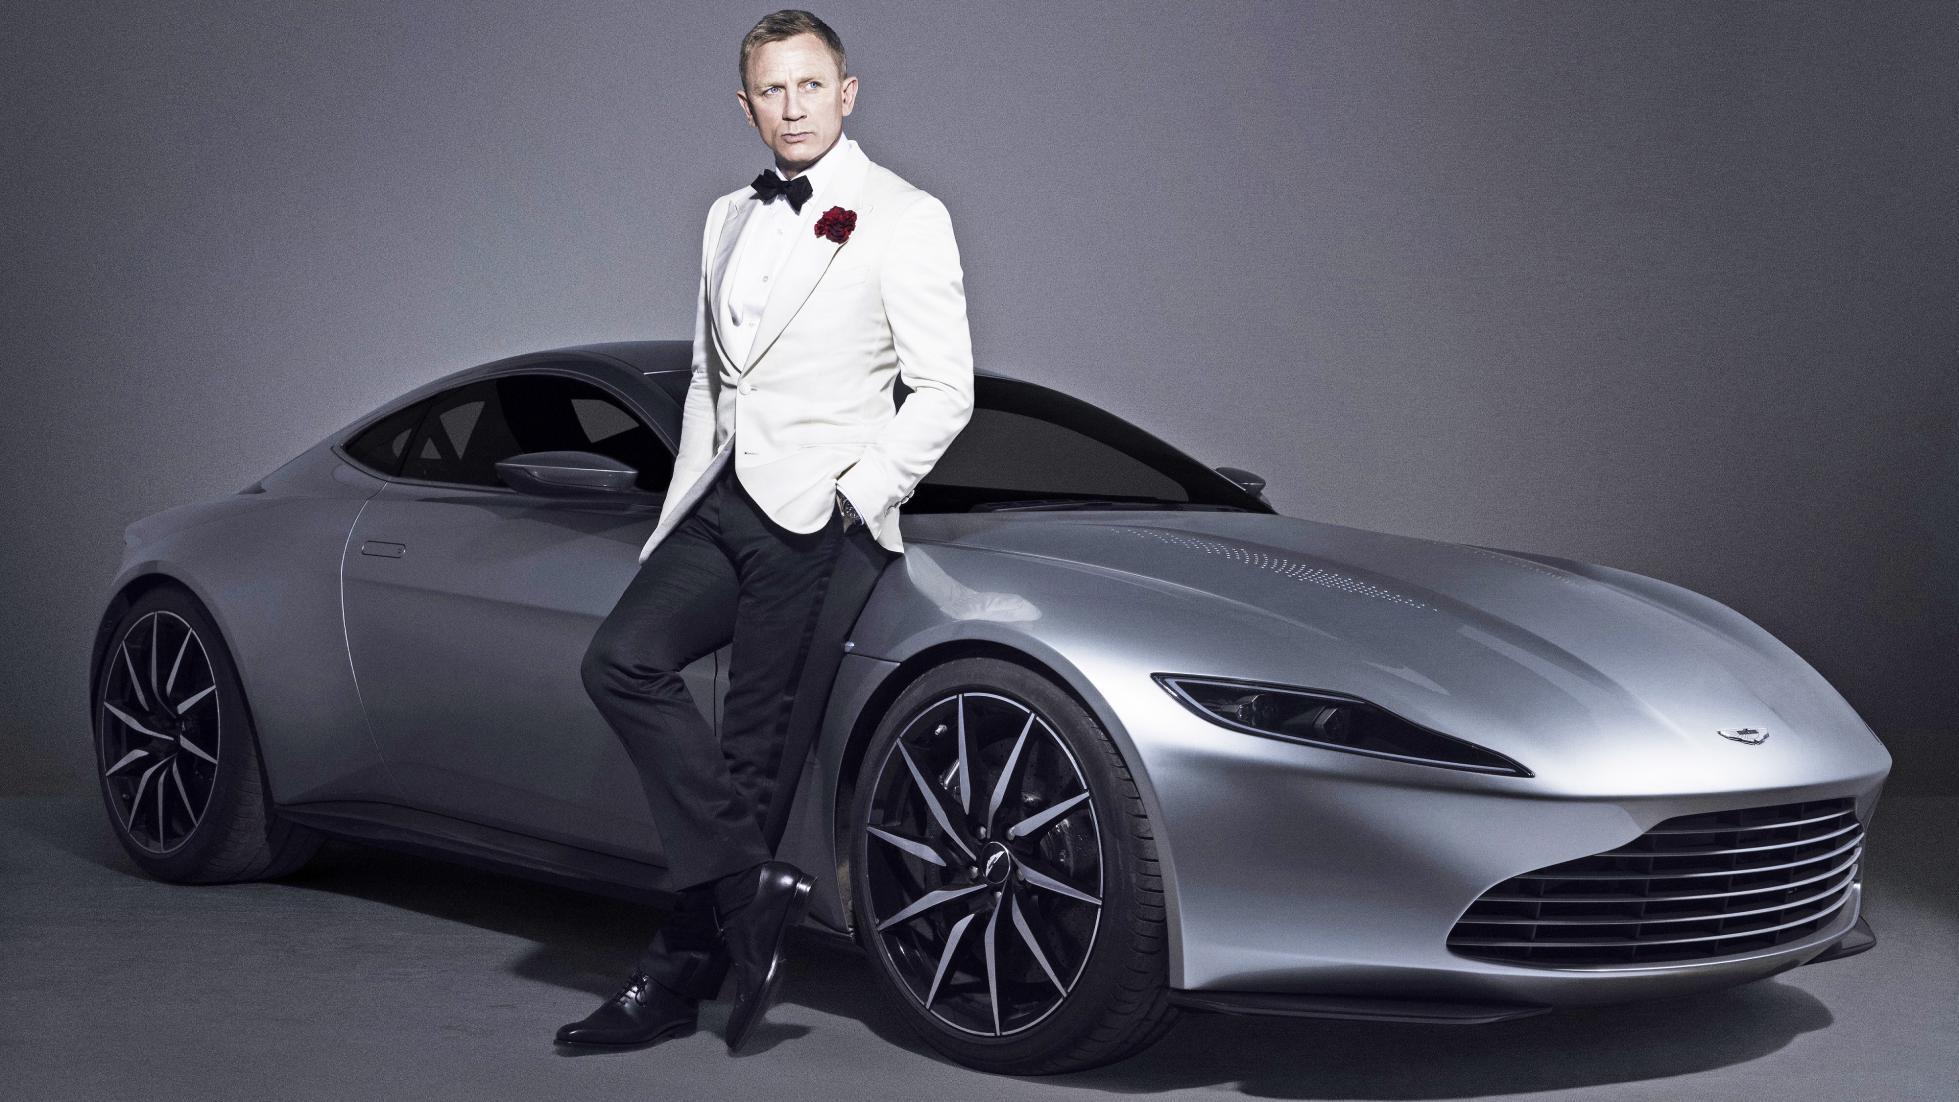 Watch 10 Cool James Bond Cars That Defined An Era Of 007 video